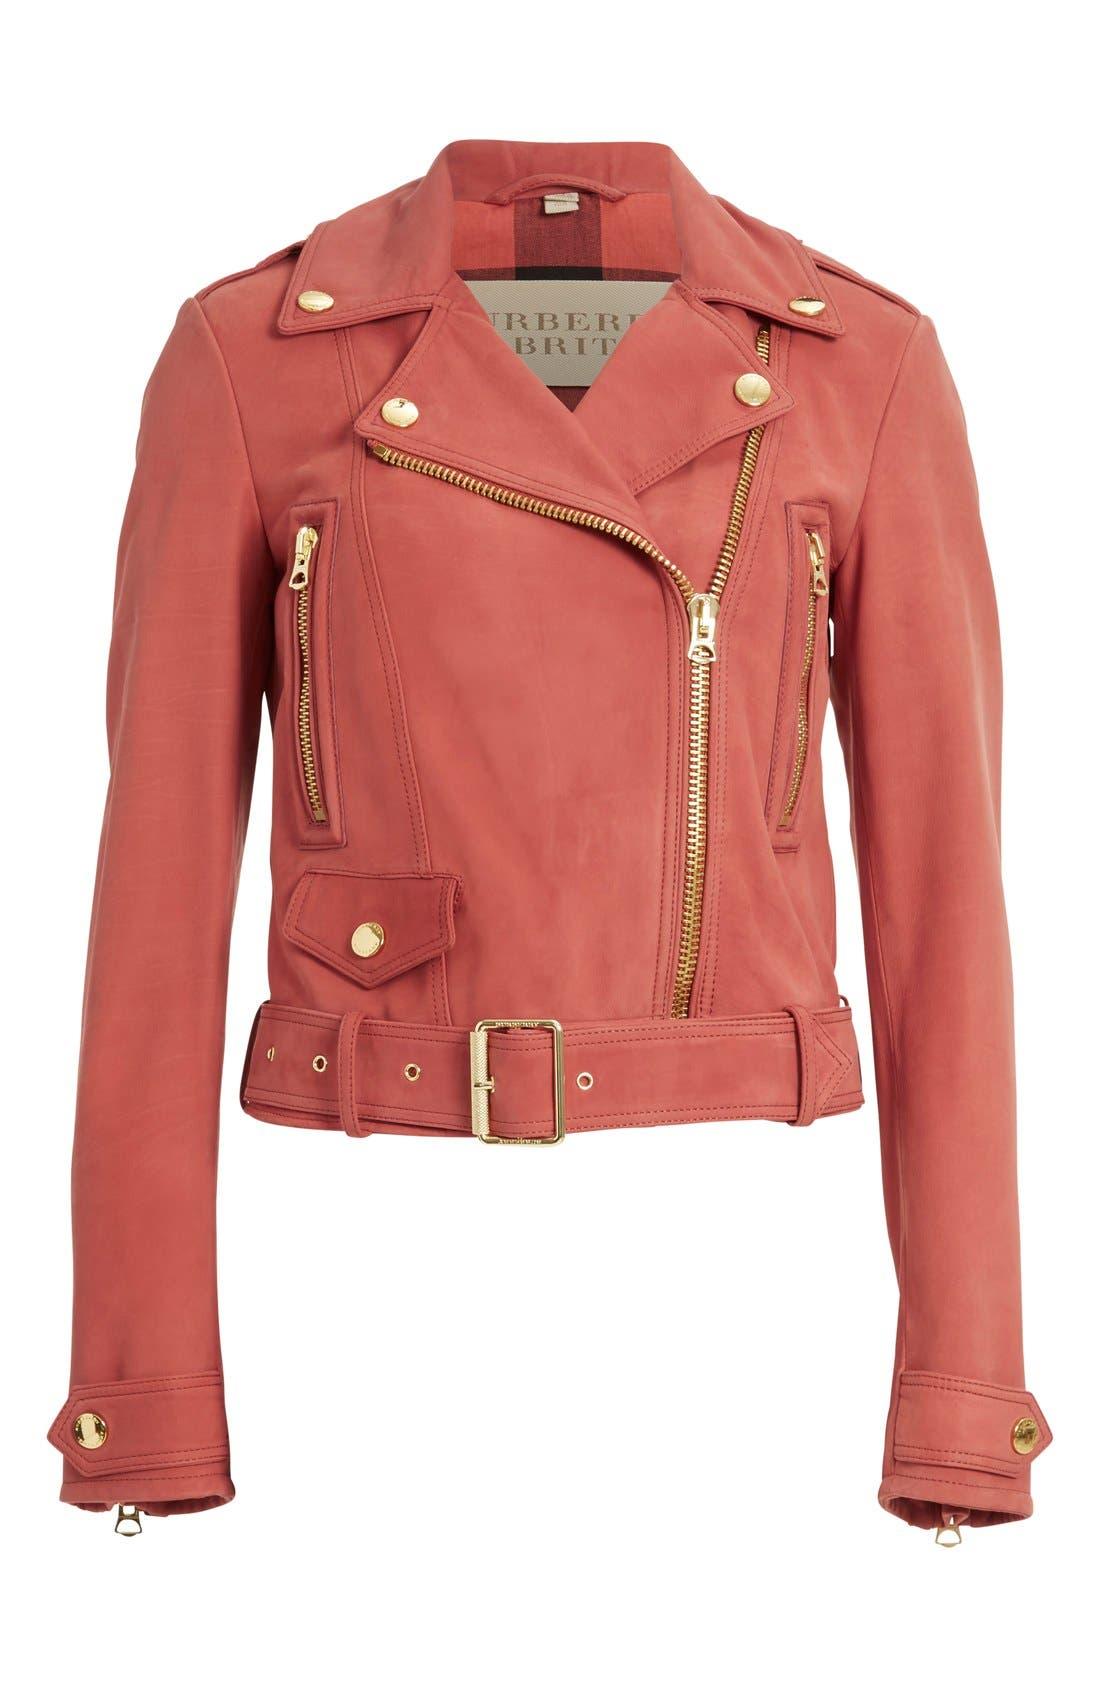 Alternate Image 4  - Burberry Brit 'Pattersby' Suede Moto Jacket